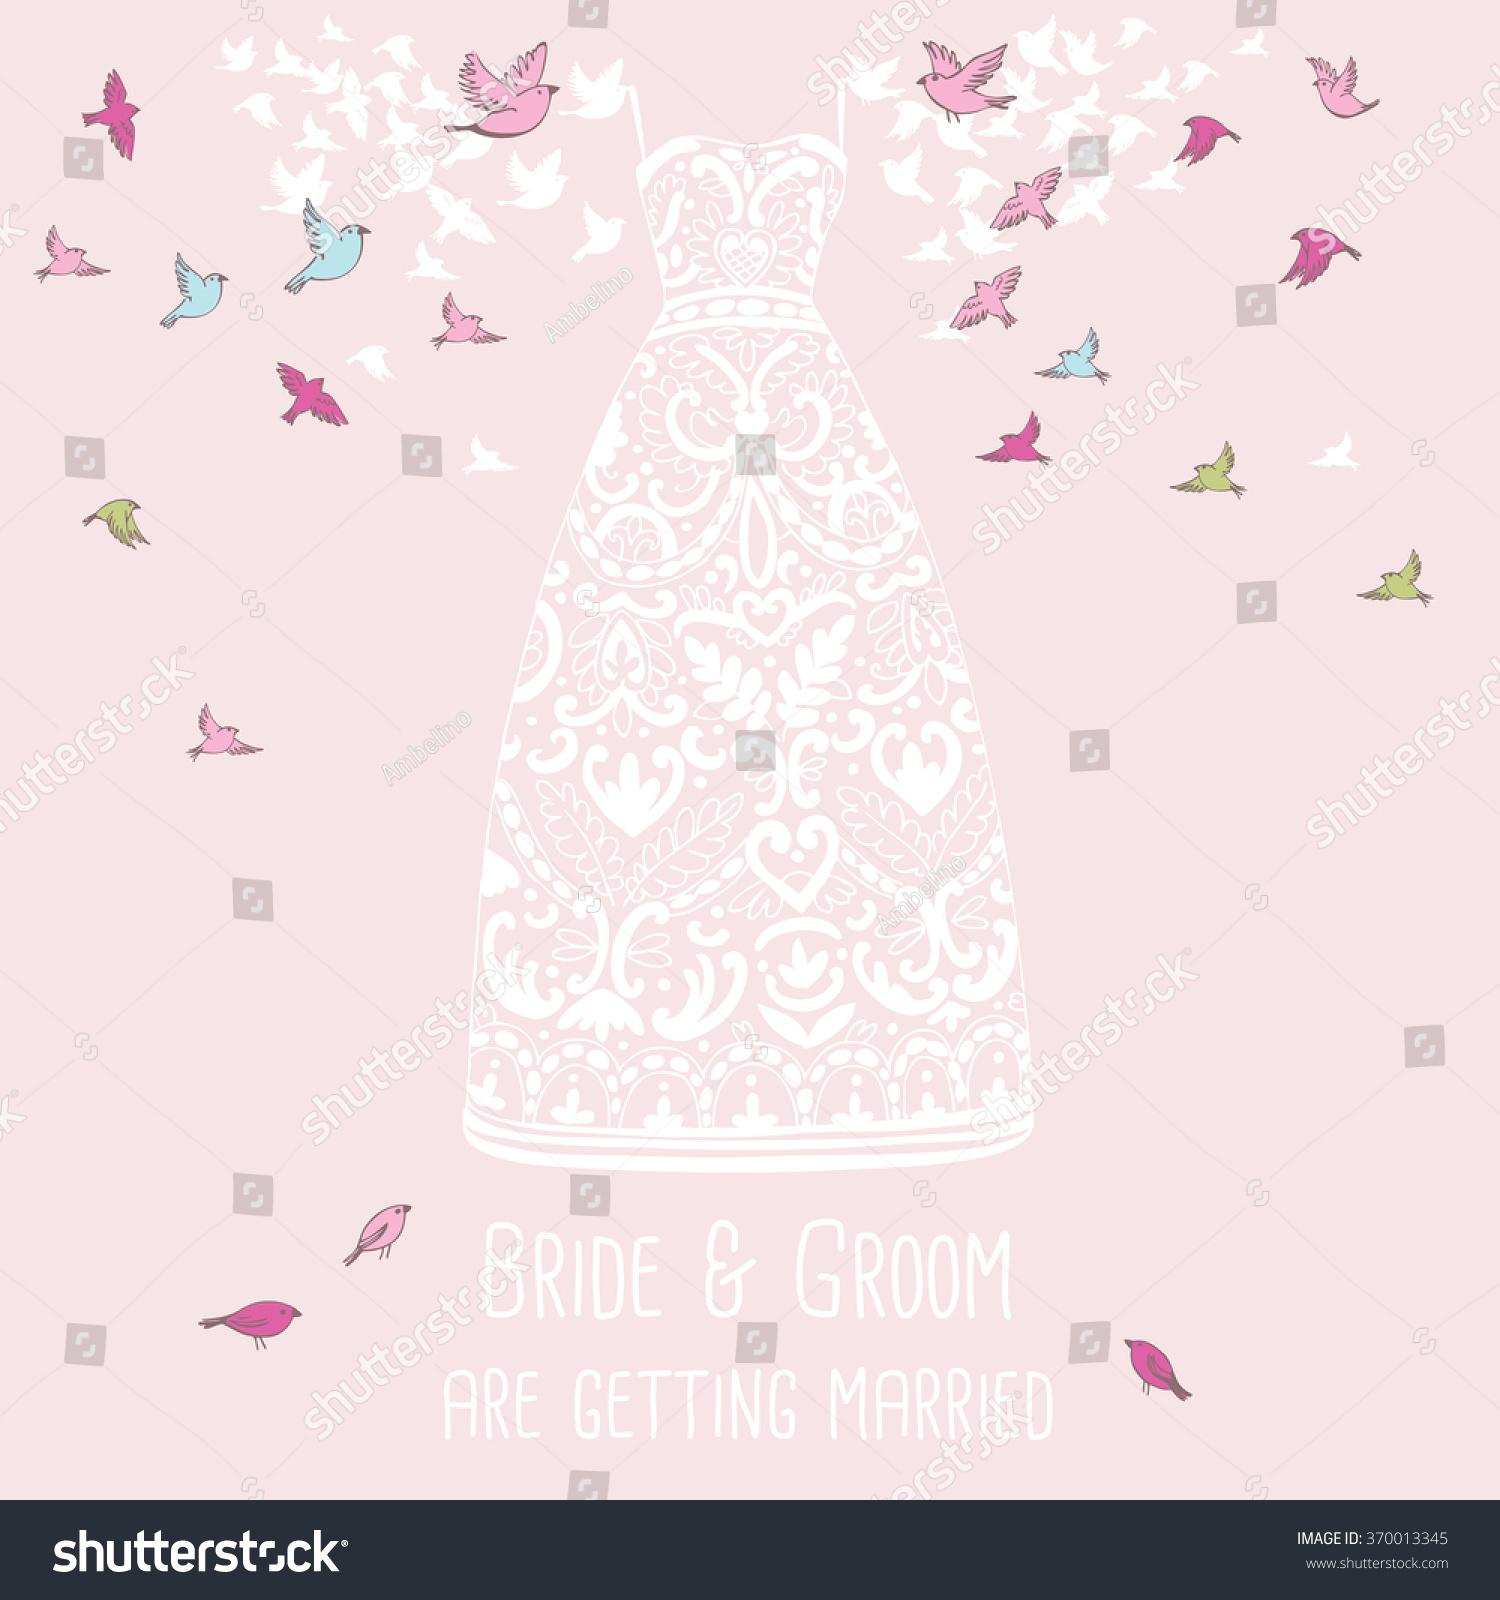 Wedding Invitation Card Birds Carrying Bride Stock Vector (2018 ...